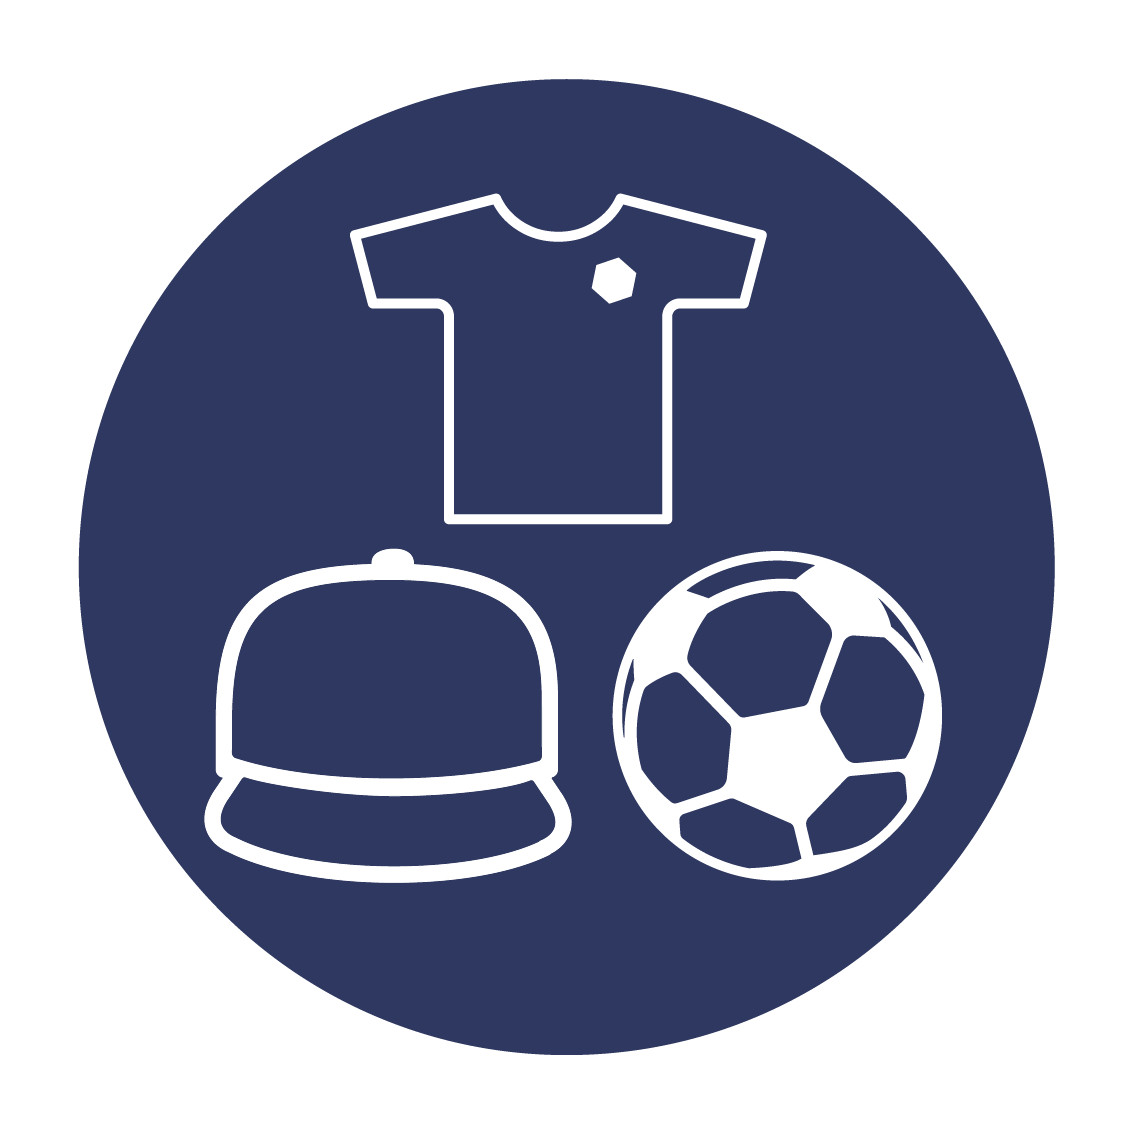 Casquette/logo/ballons